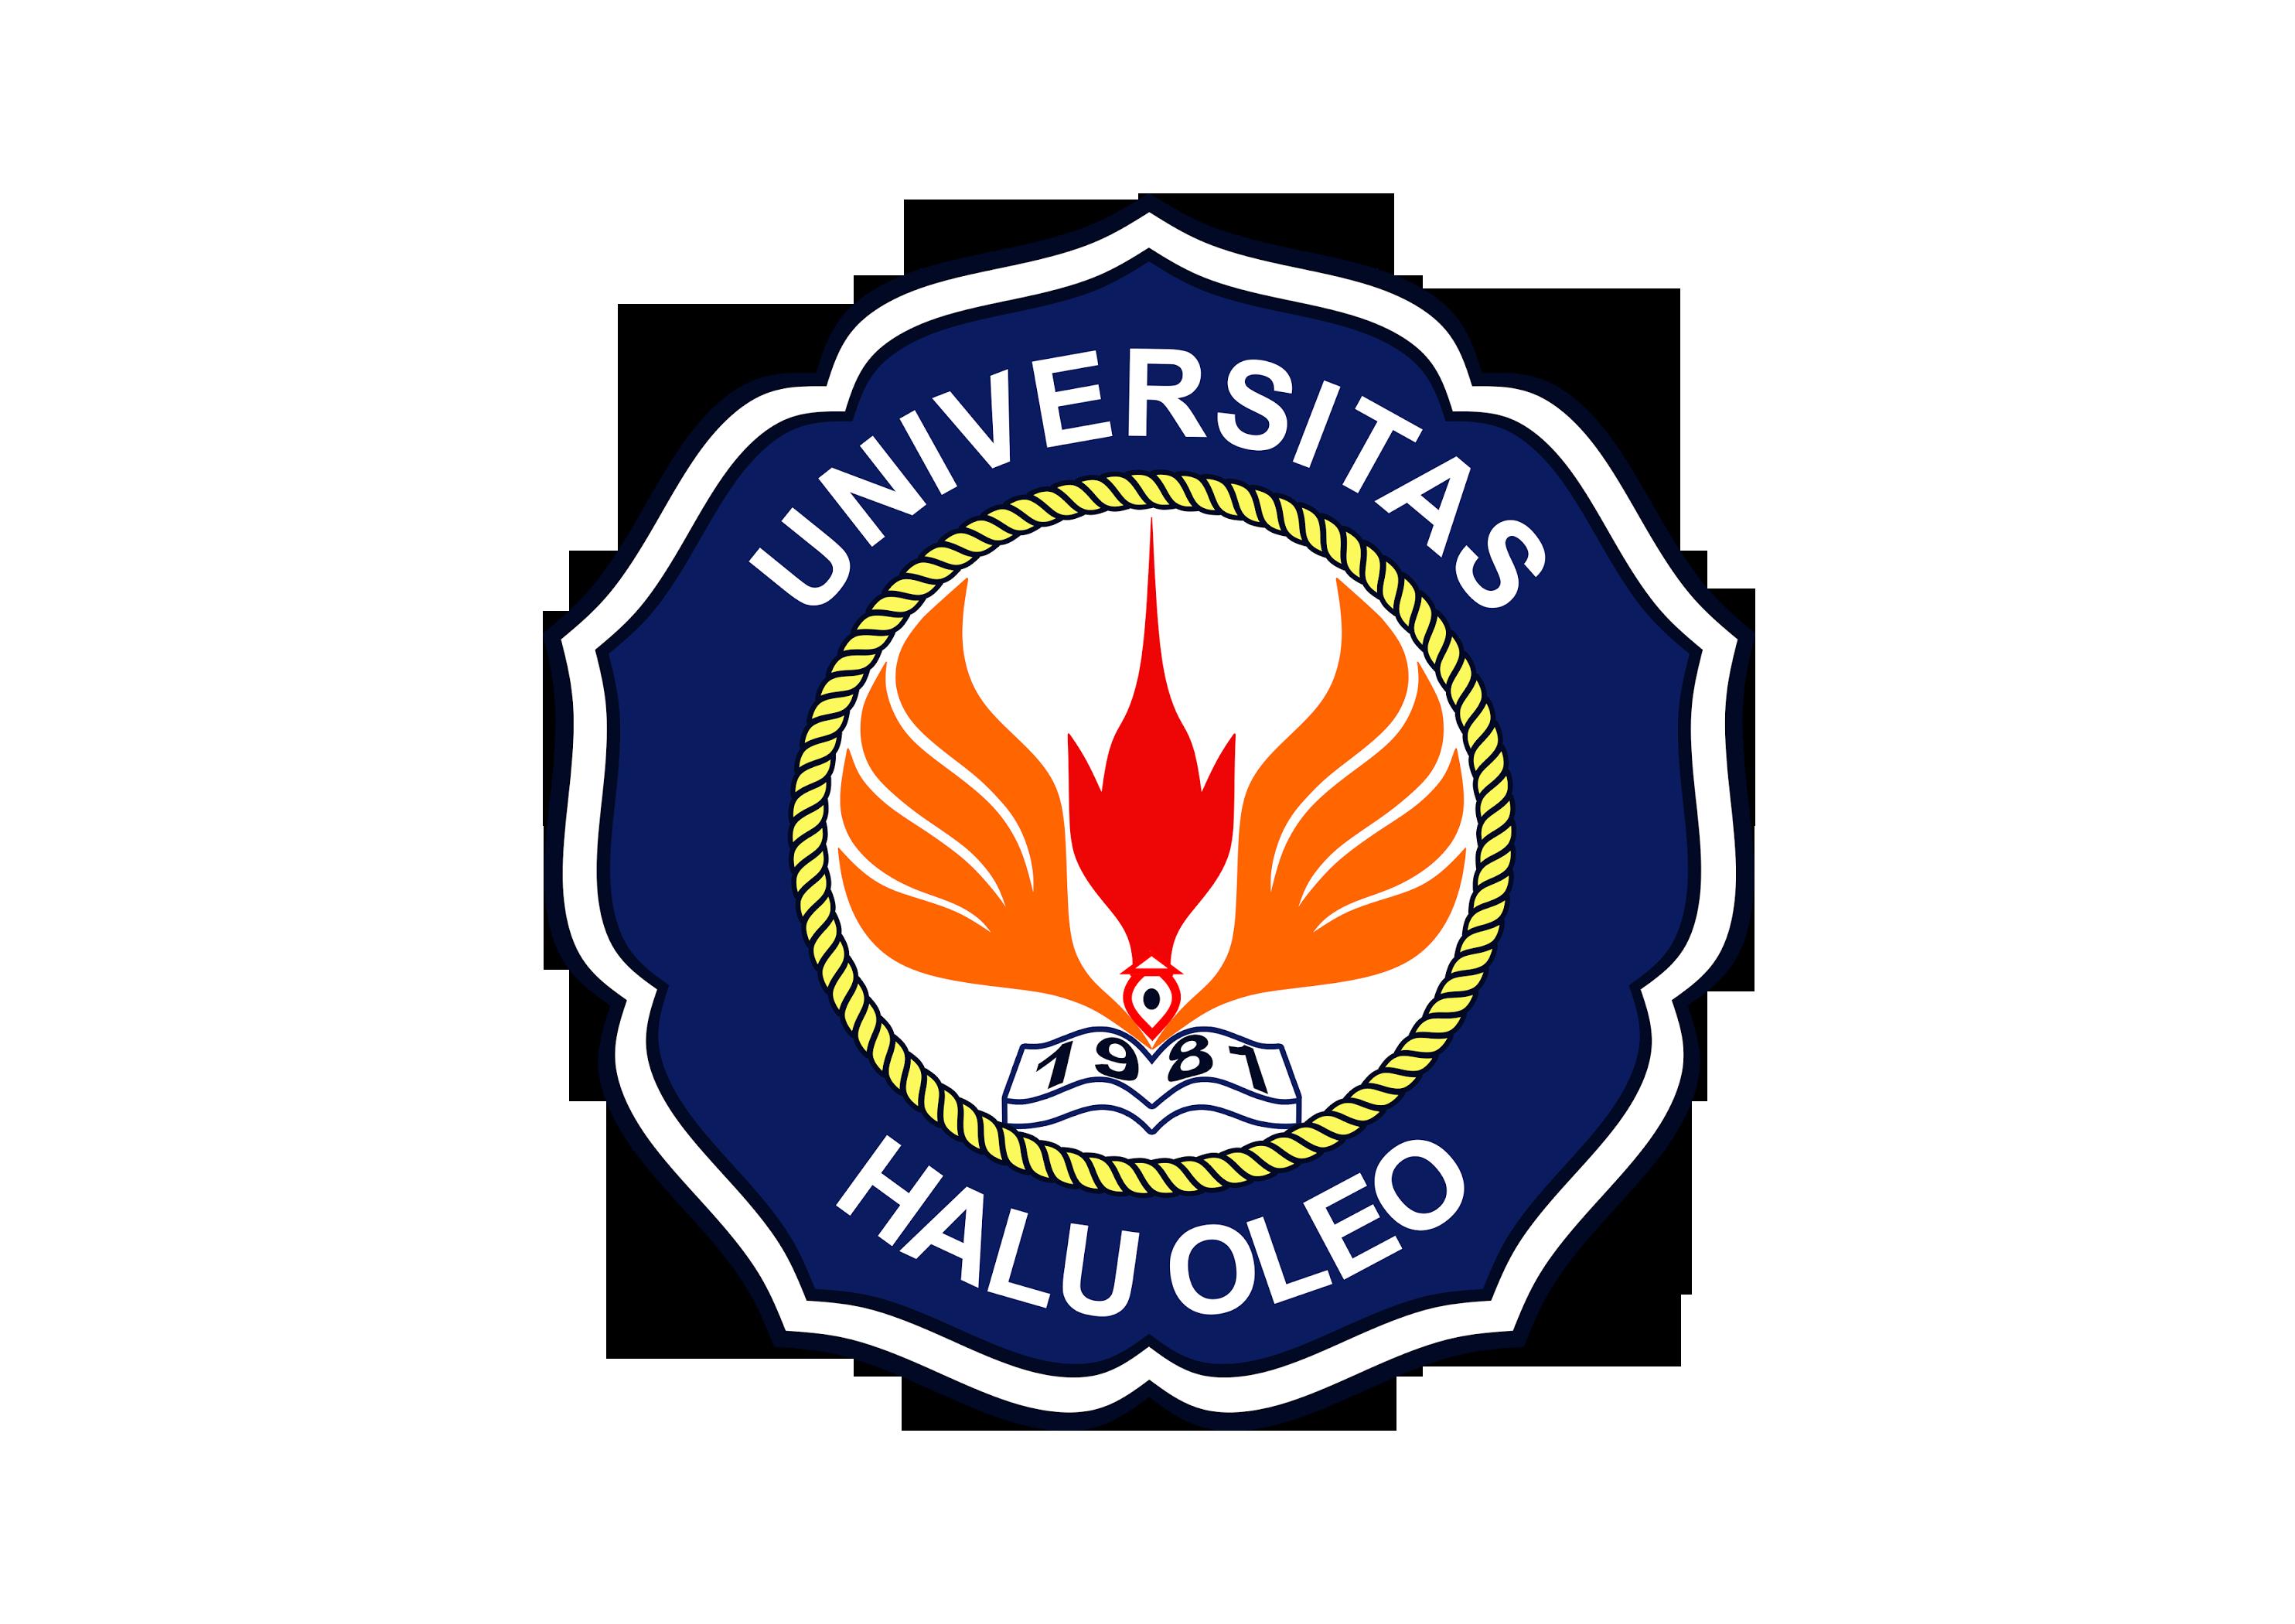 Logo UHO (Universitas Halu Oleo) Original PNG